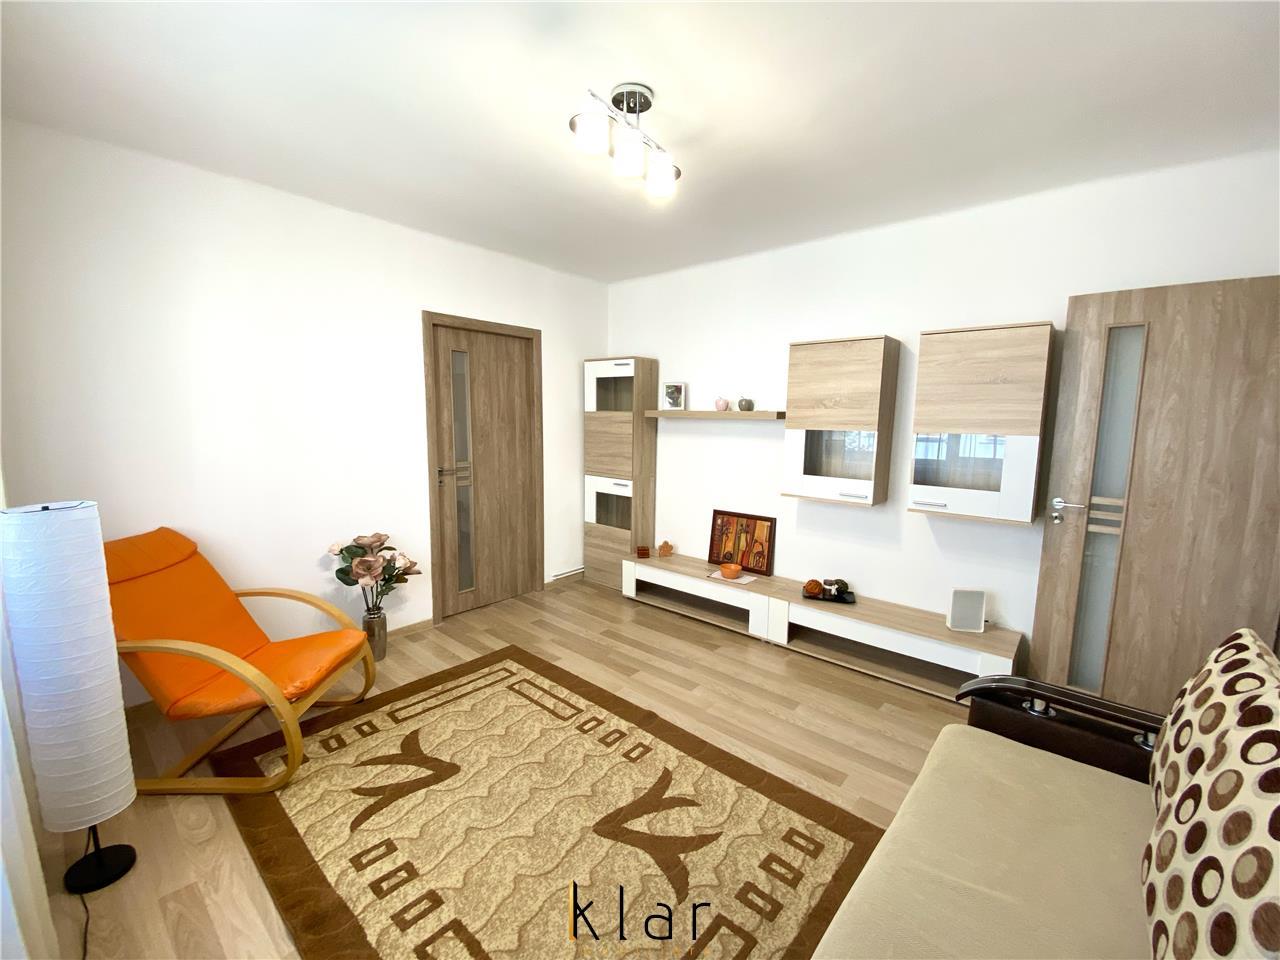 Apartament cu 2 camere zona centrala